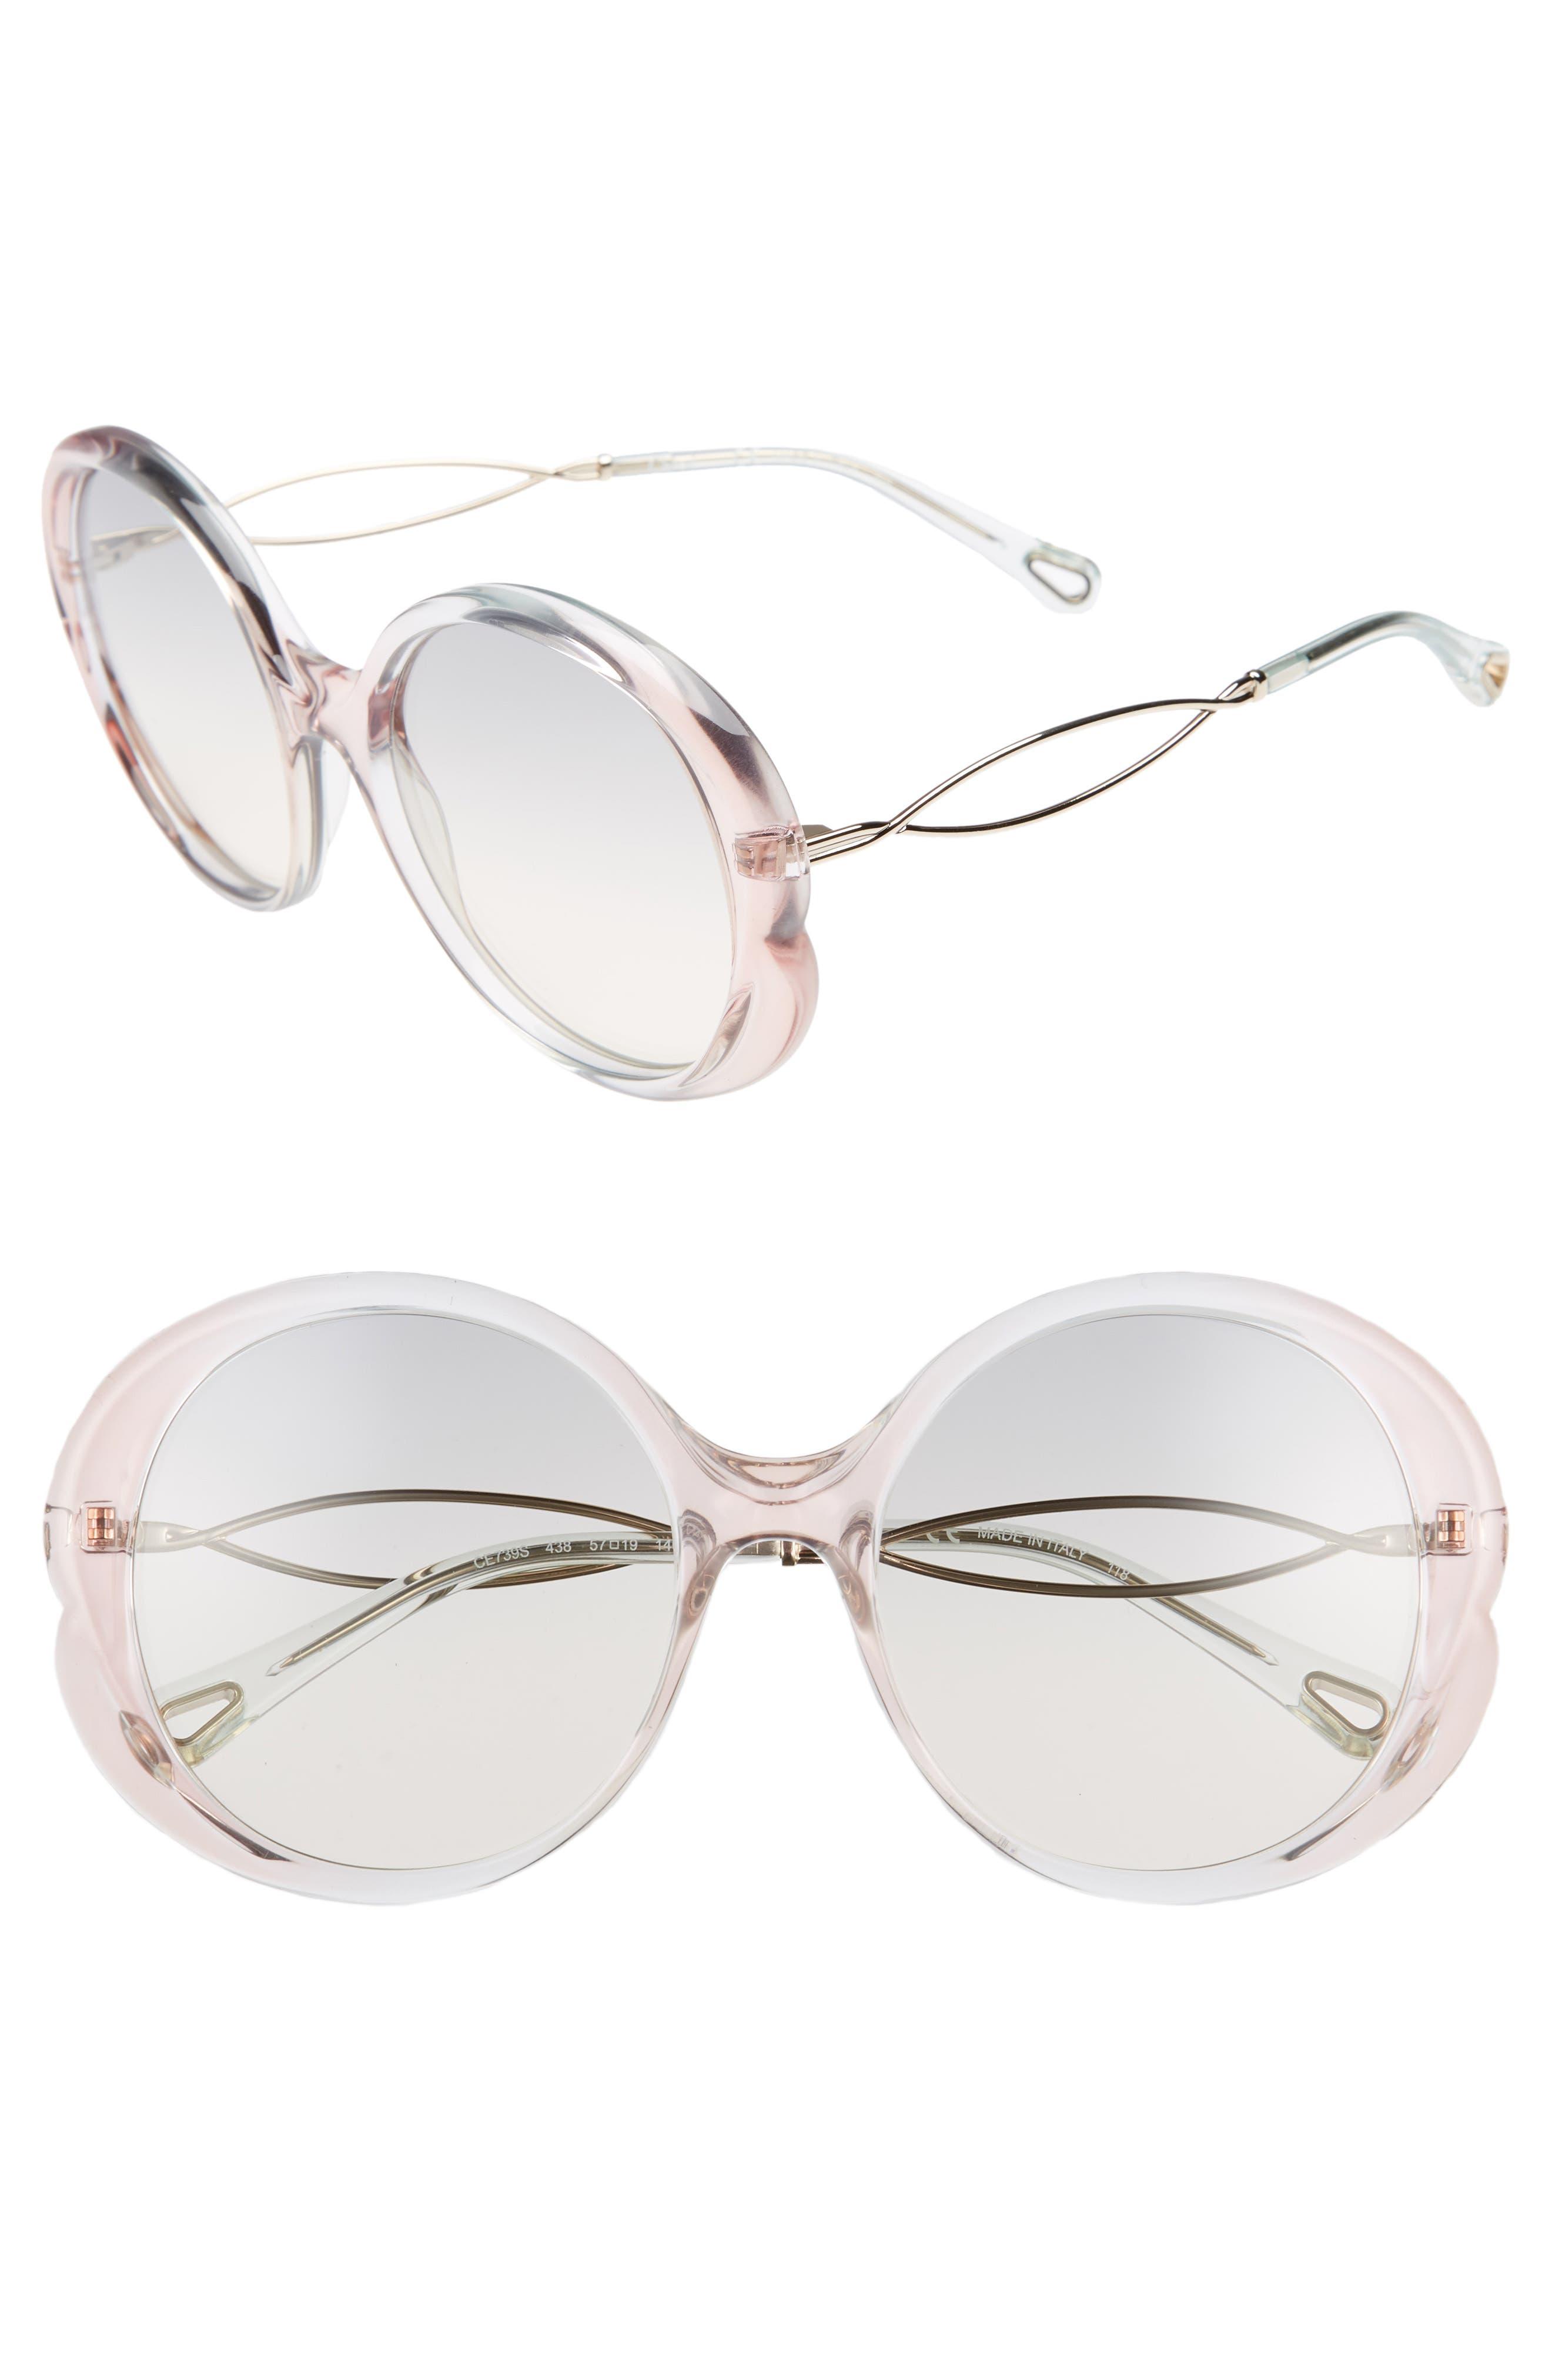 Chloé Petal 57mm Gradient Round Sunglasses